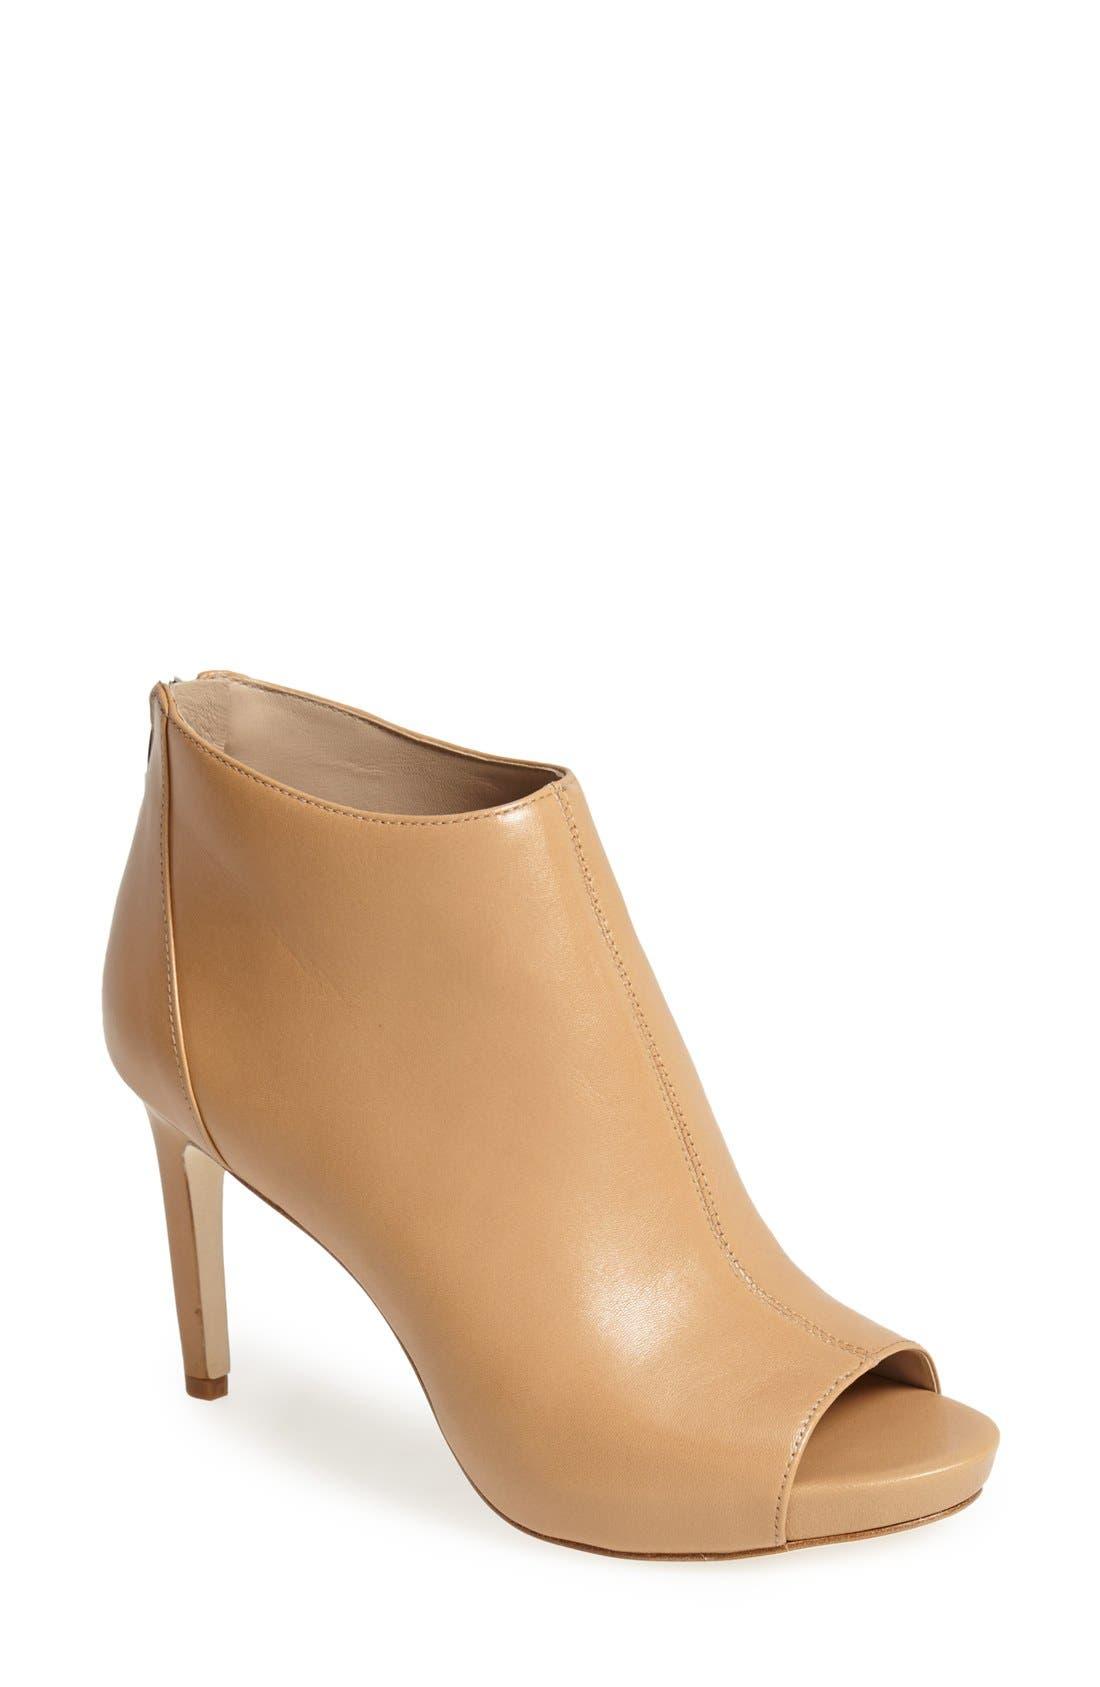 Main Image - Via Spiga 'Nessa 2' Leather Open Toe Bootie (Women)